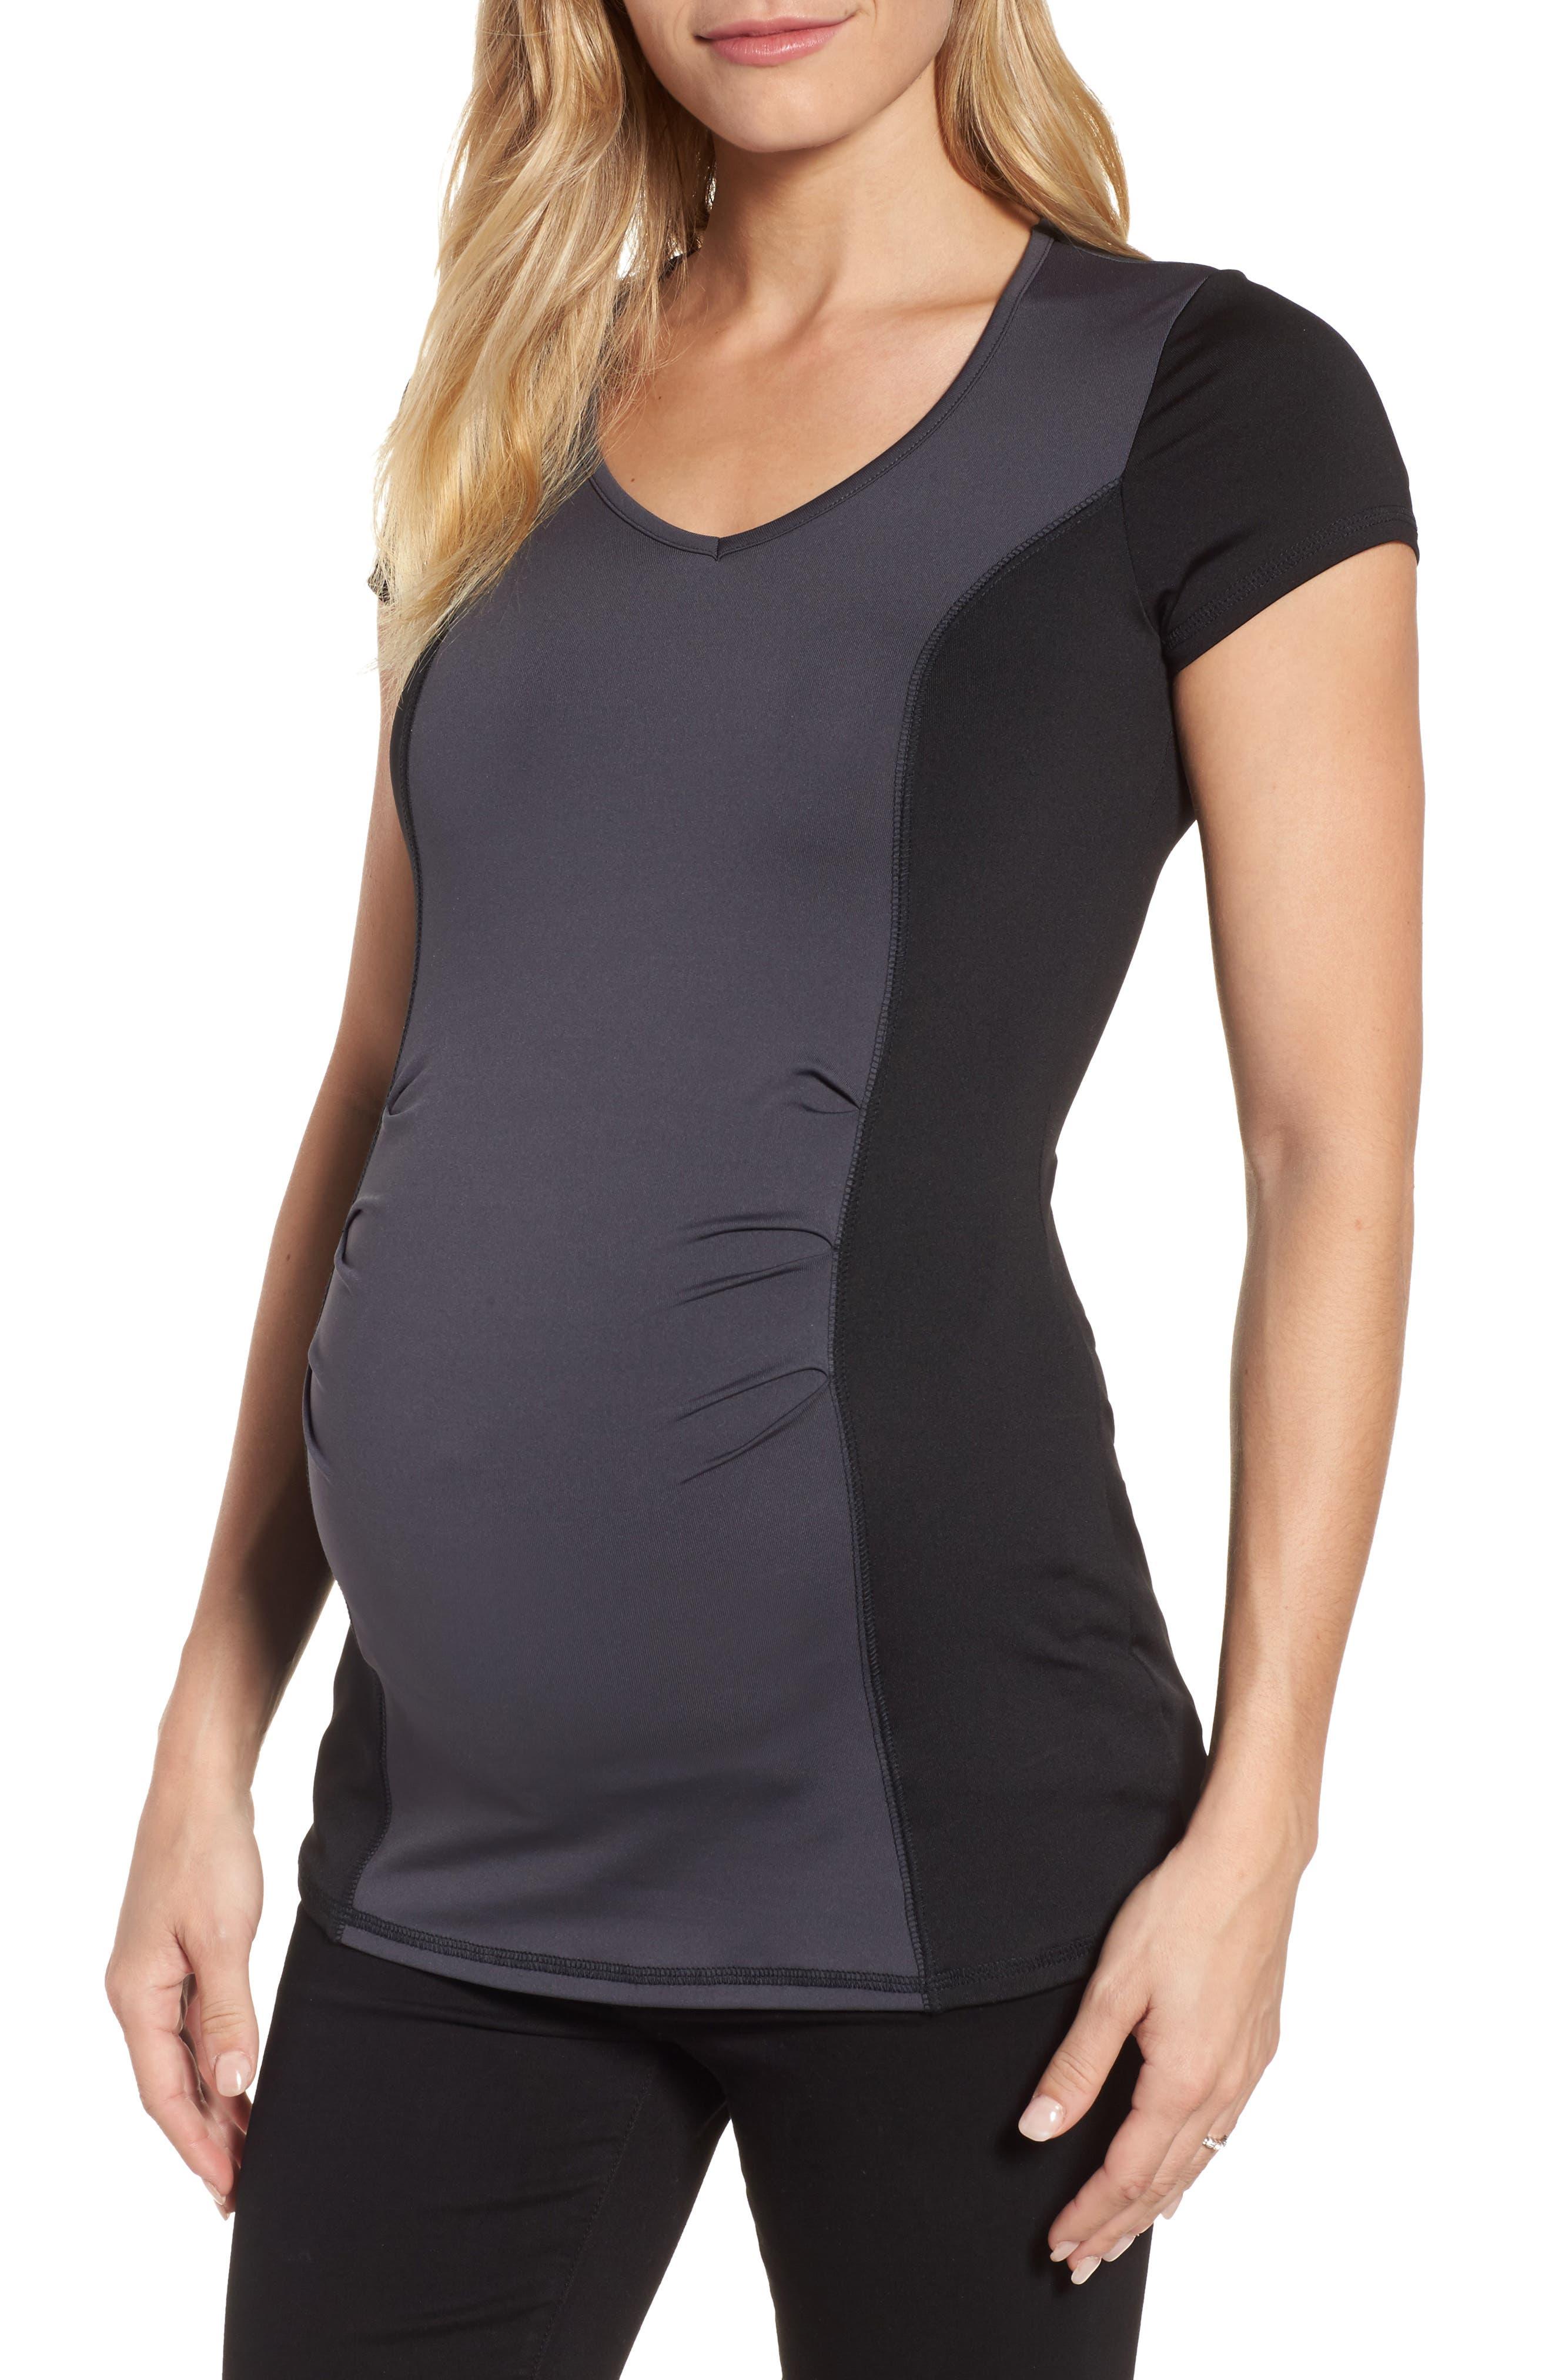 Colorblock Maternity Top,                         Main,                         color, Charcoal/ Black